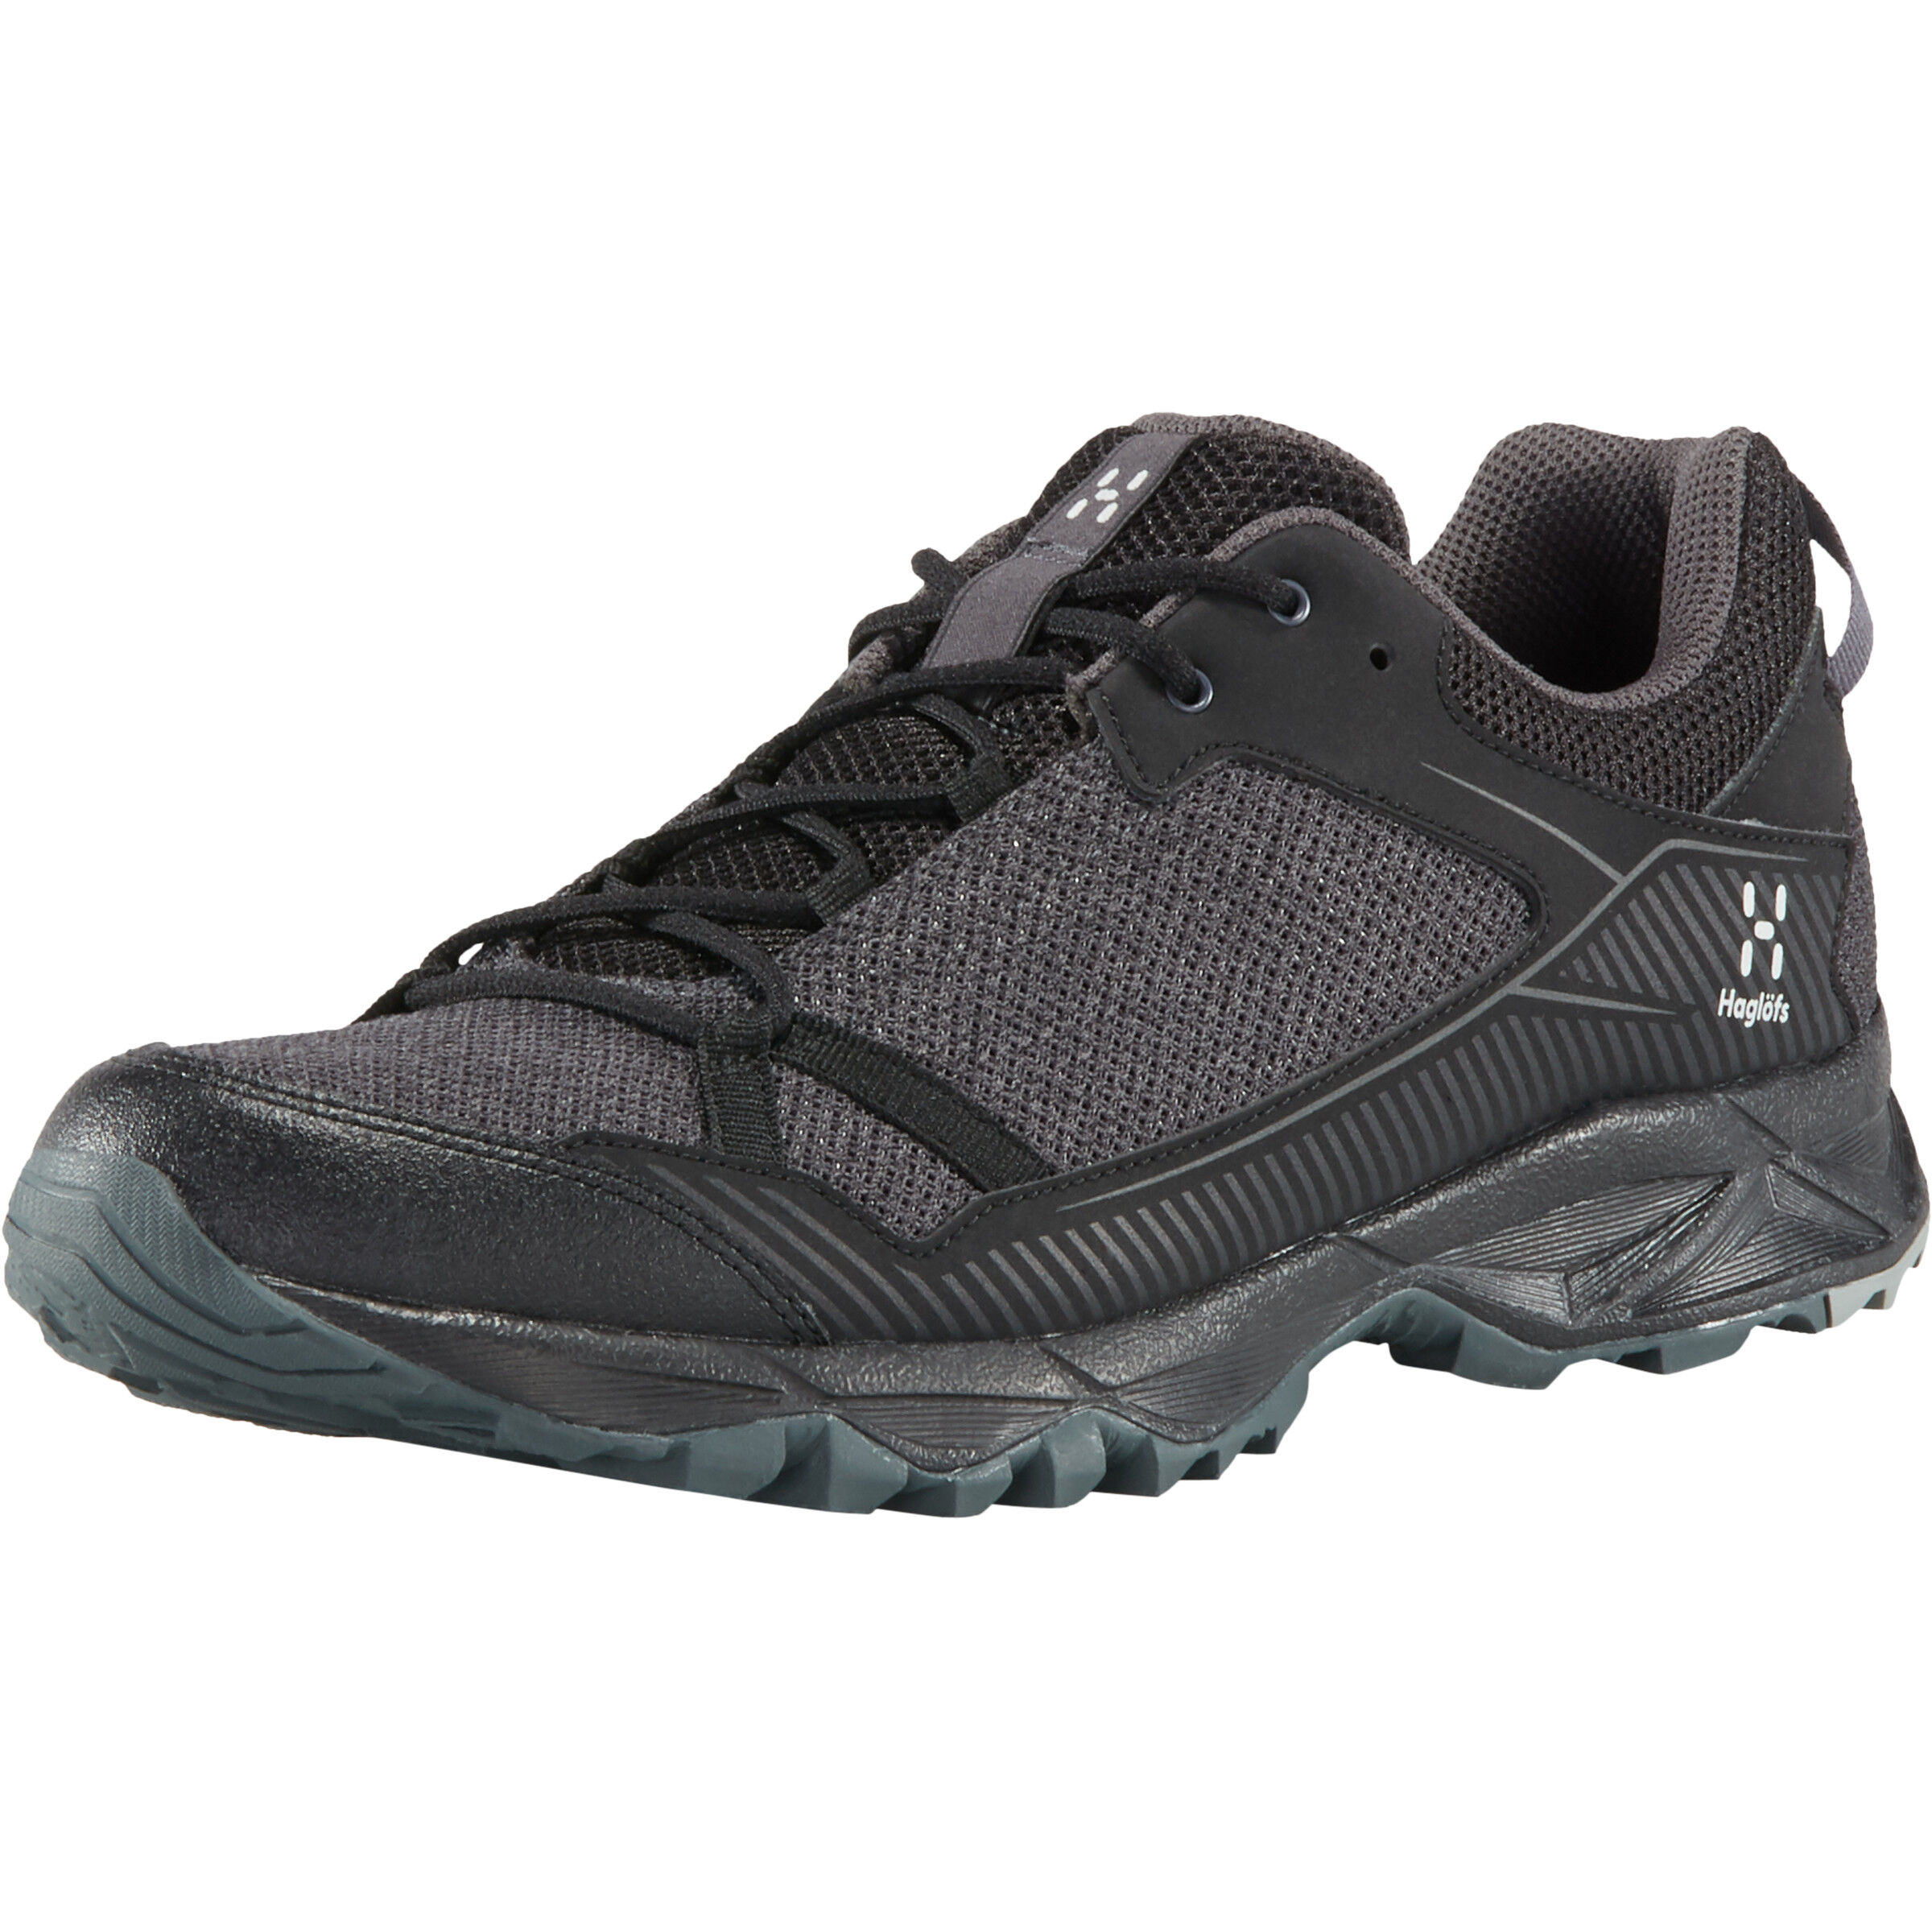 Haglofs Outdoor Grau Schwarz Schuhe Trekking Turnschuhe